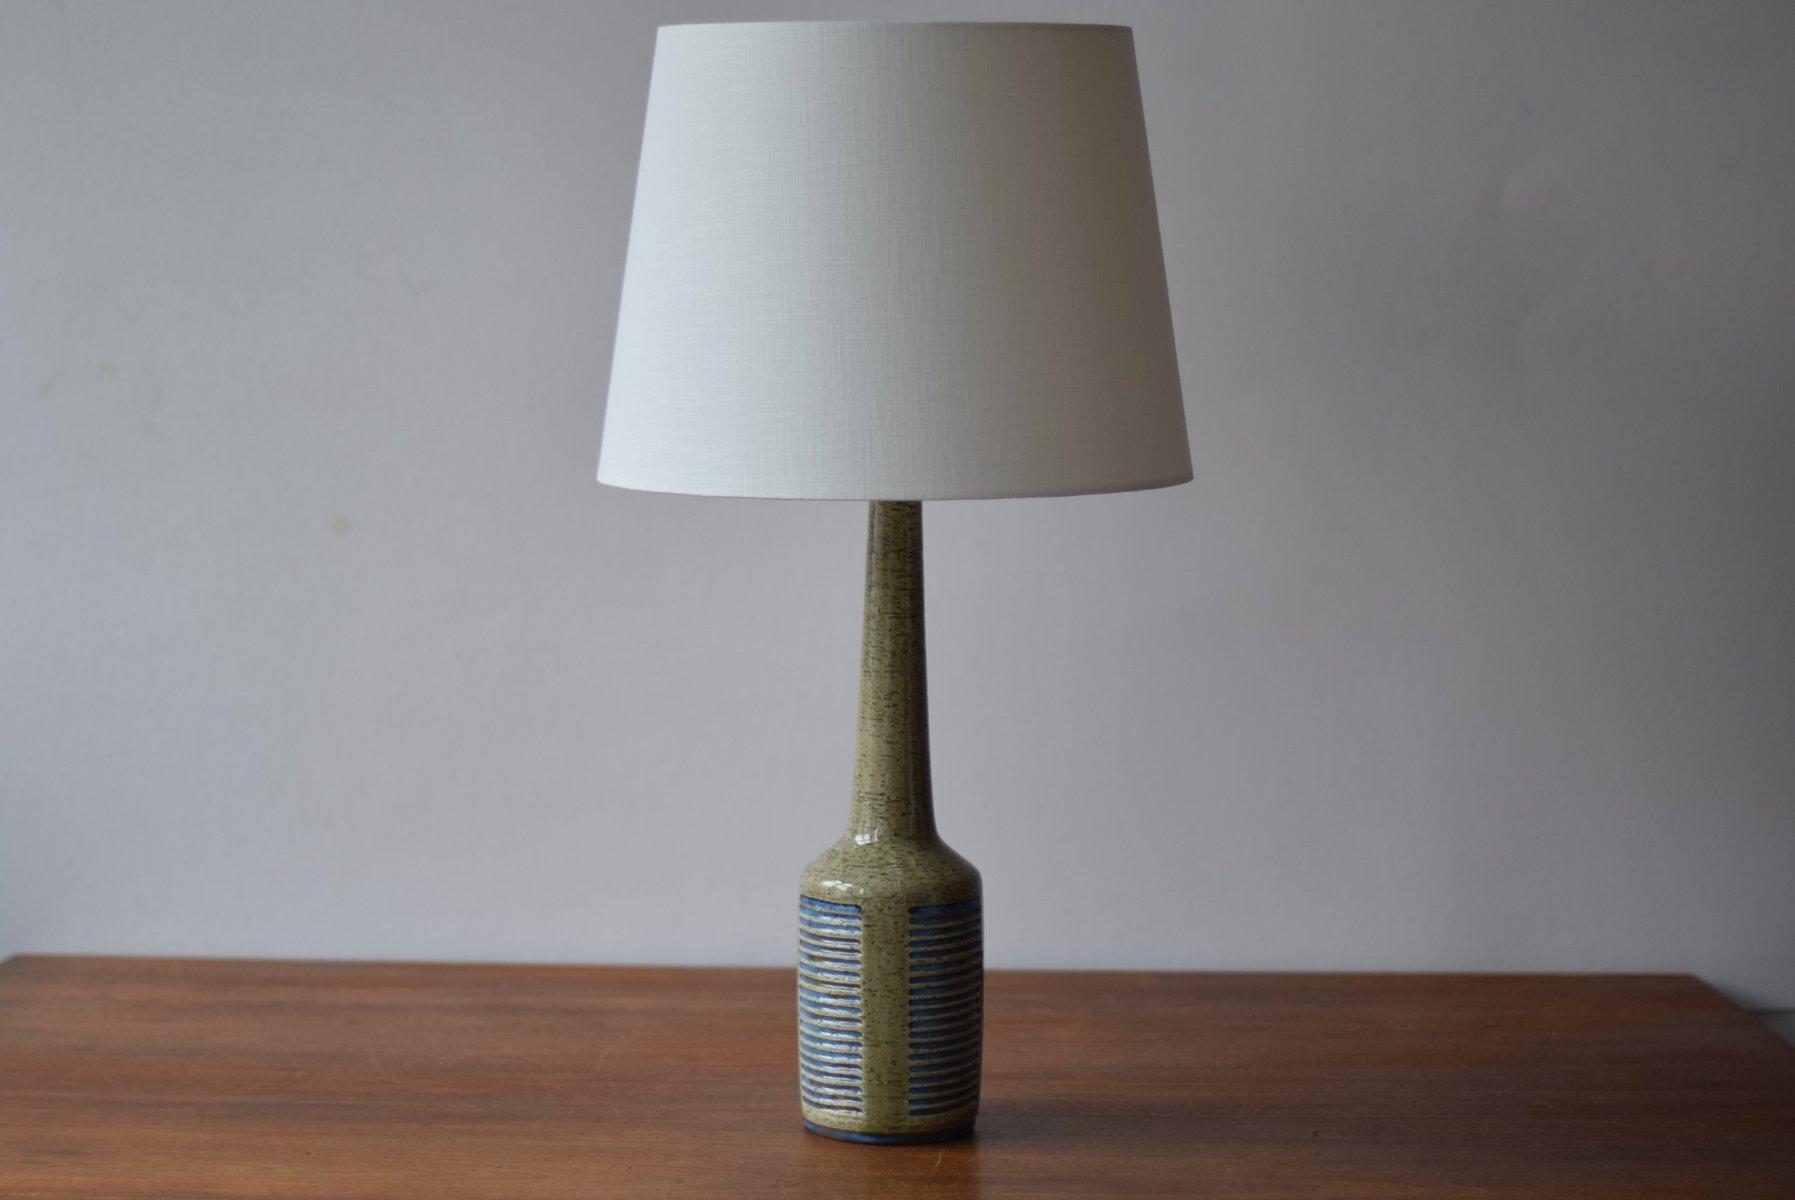 Lampe de bureau scandinave verte p le bleue par per - Lampe de bureau scandinave ...